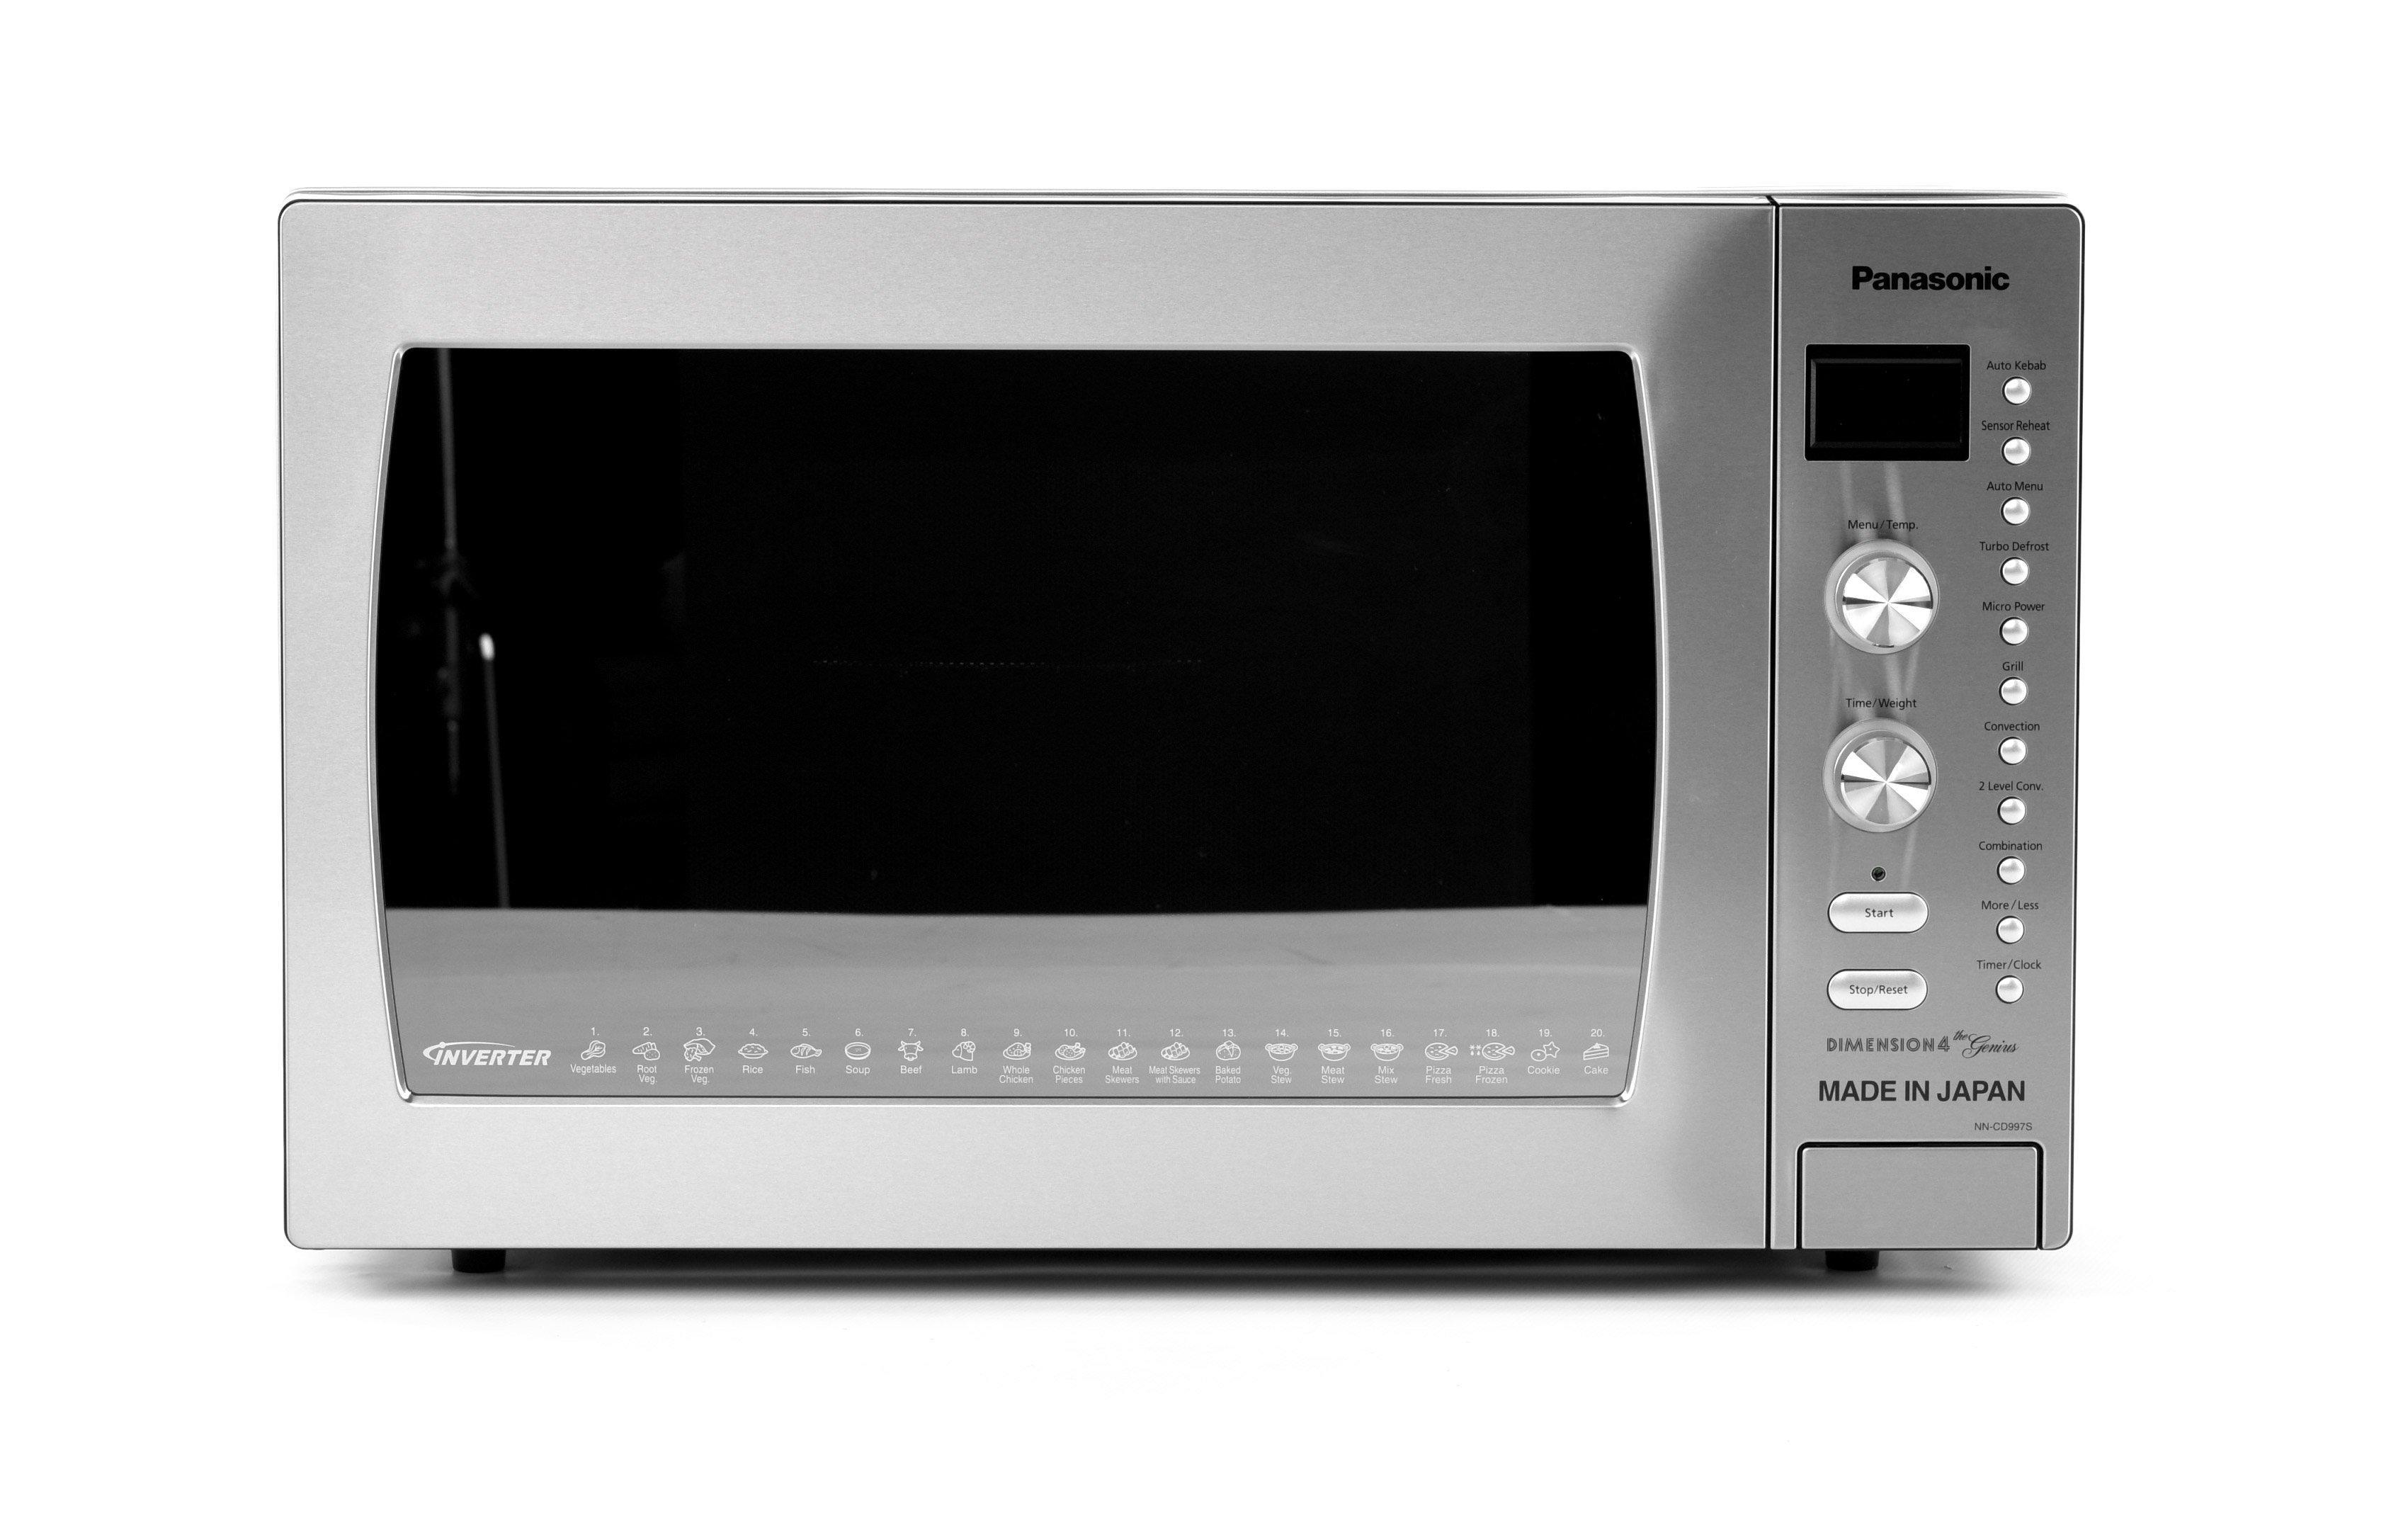 Panasonic, Microwave Oven, 42L, Stainless Steel - eXtra Saudi